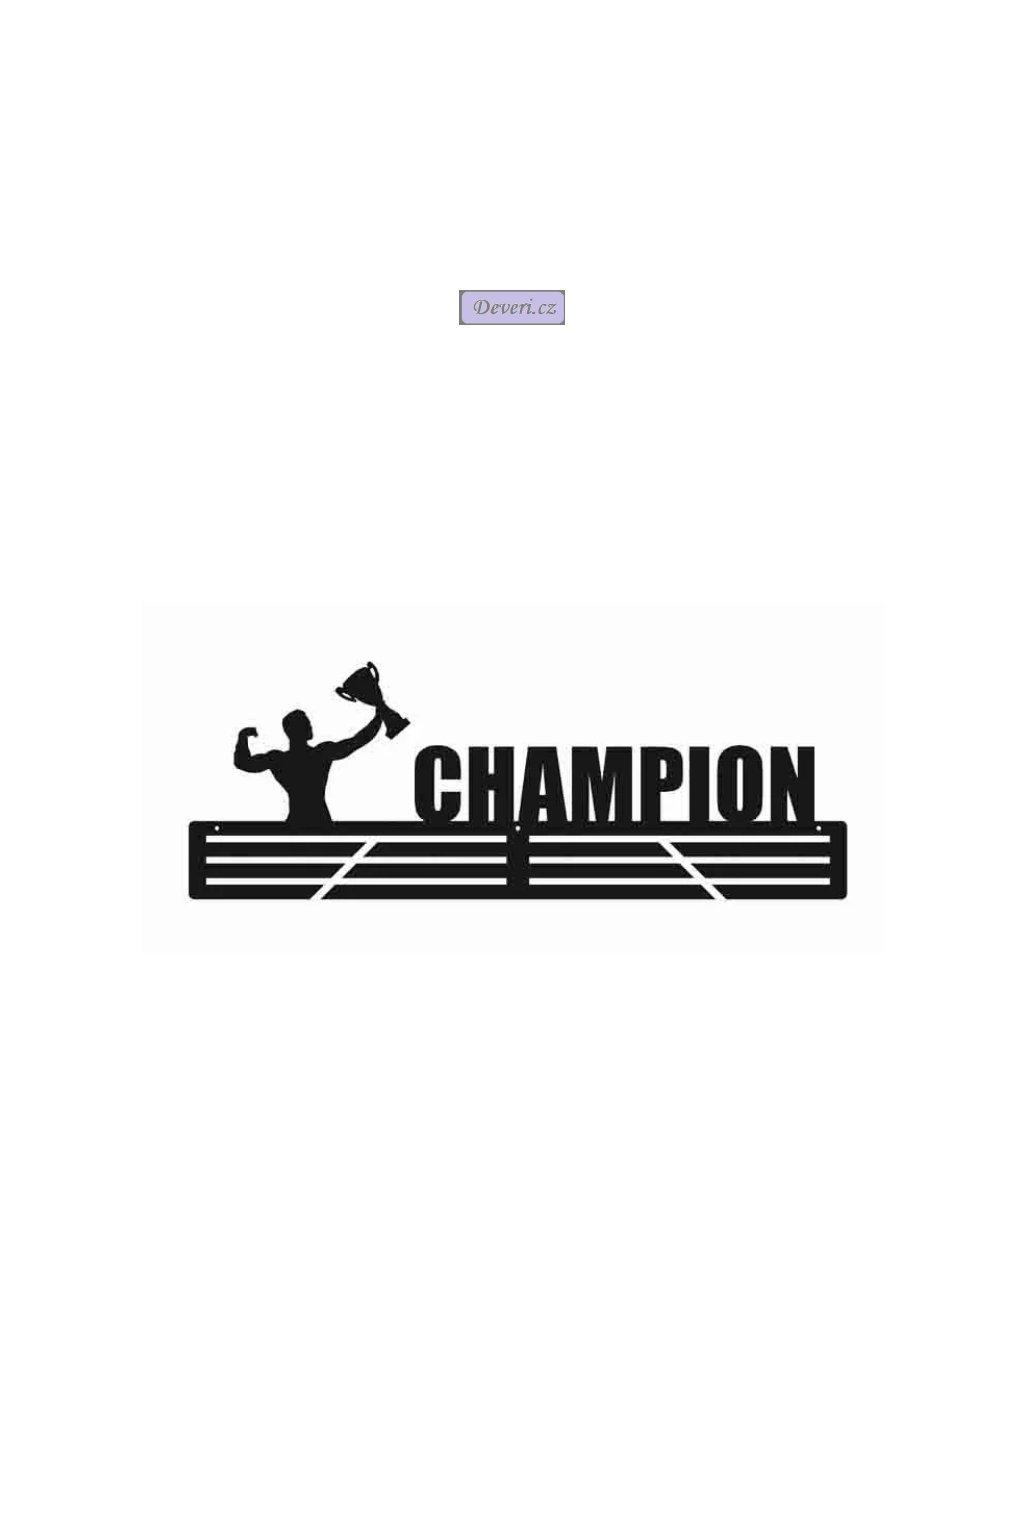 medale1 50cm